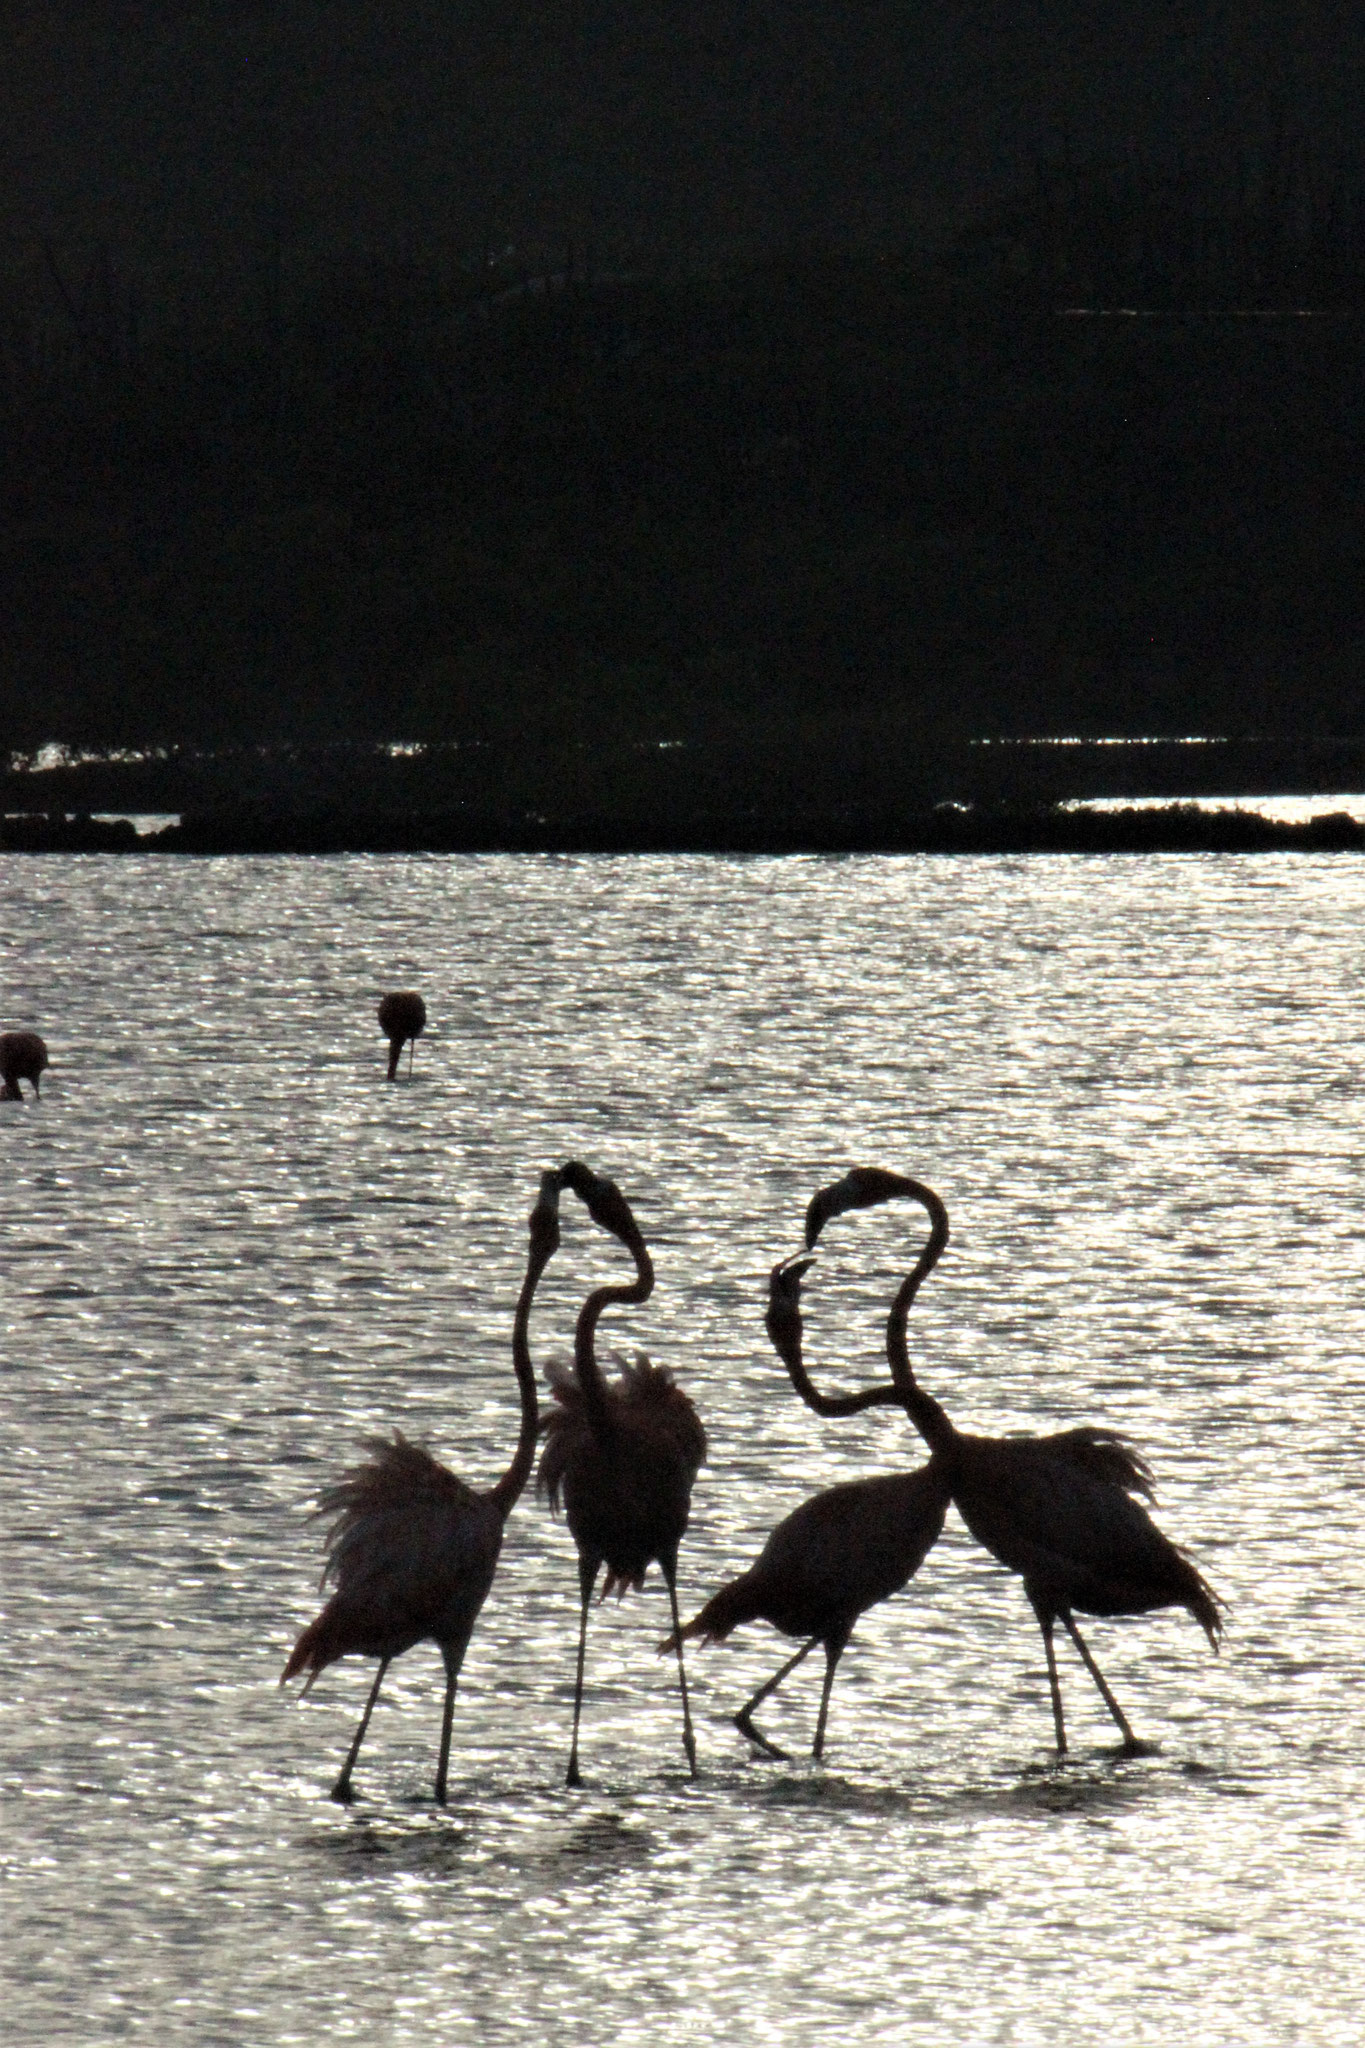 Flamingos-urlaub-curacao-ferienhaus-pool-karibik